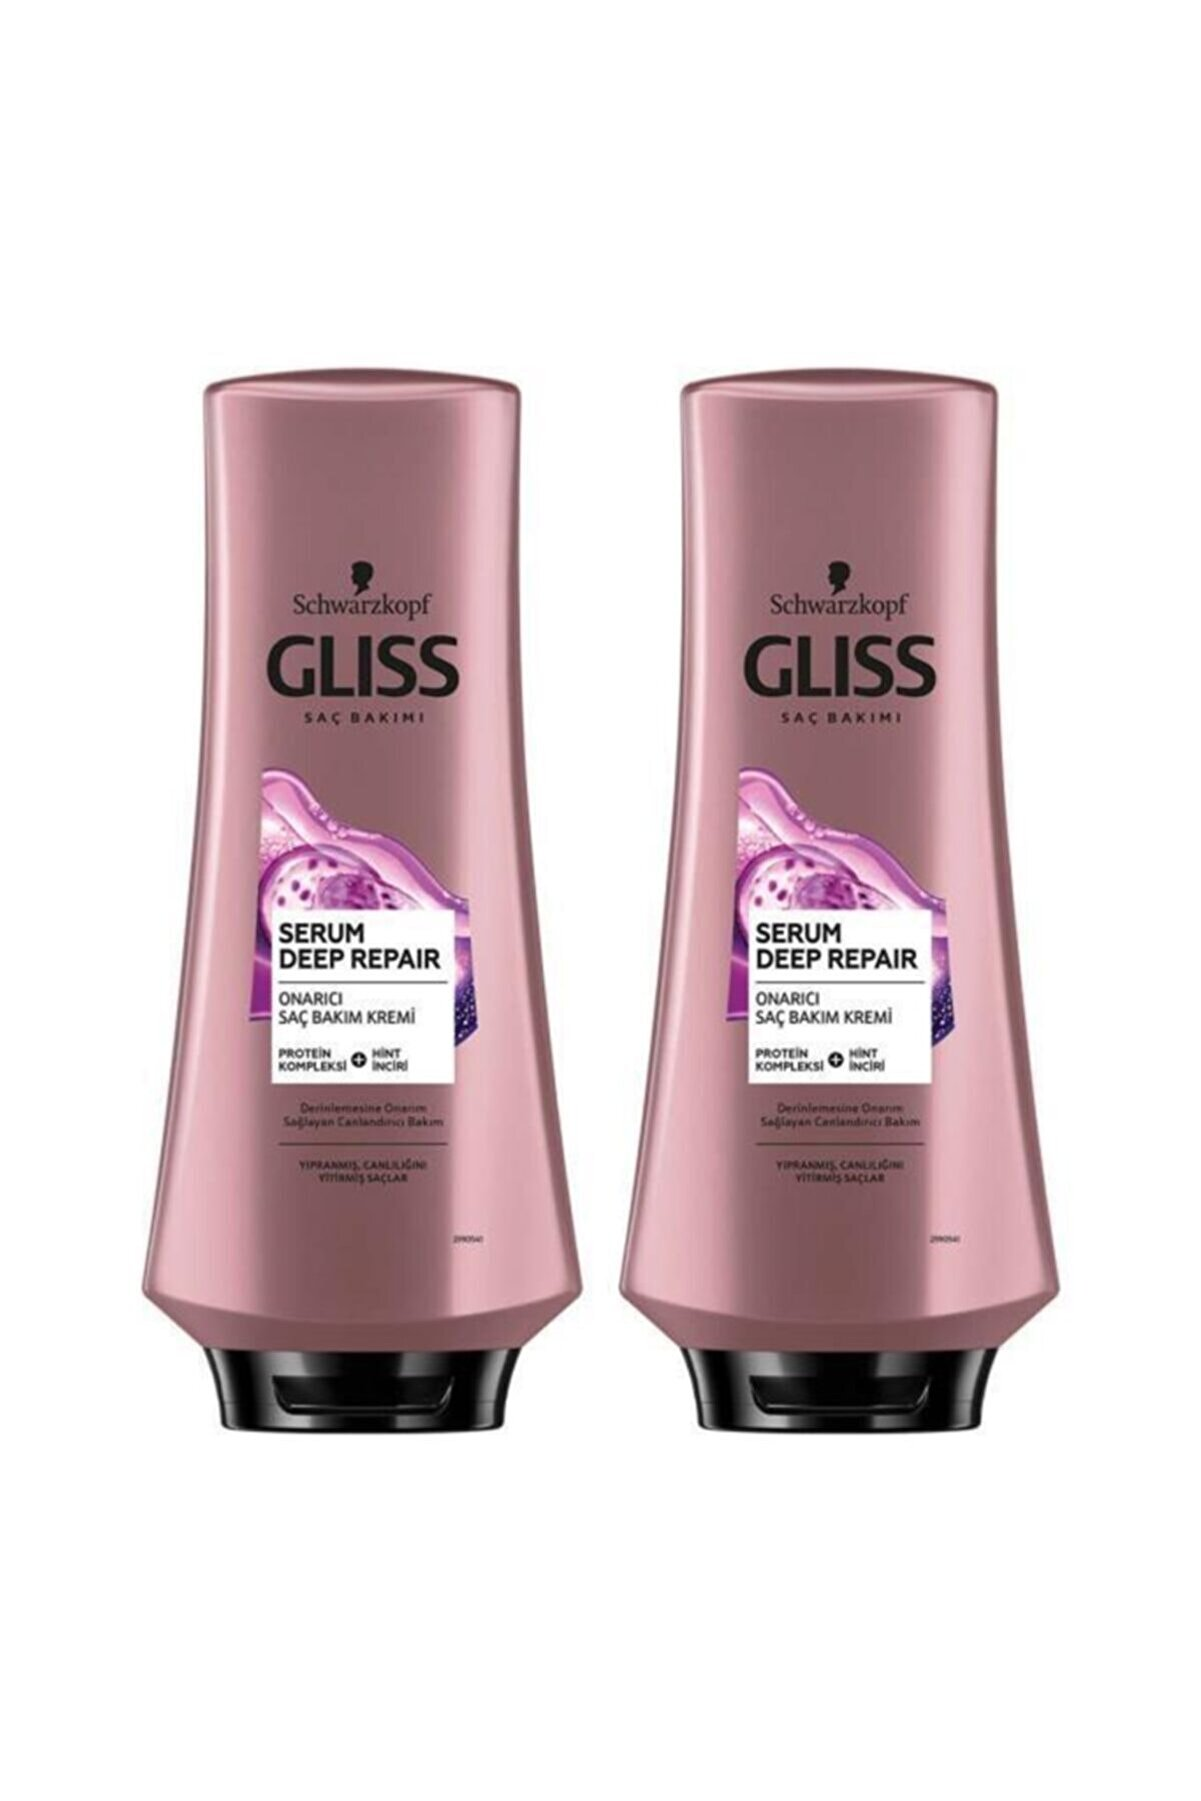 Gliss Serum Deep Repair Onarıcı Saç Kremi 360 ml 2'li